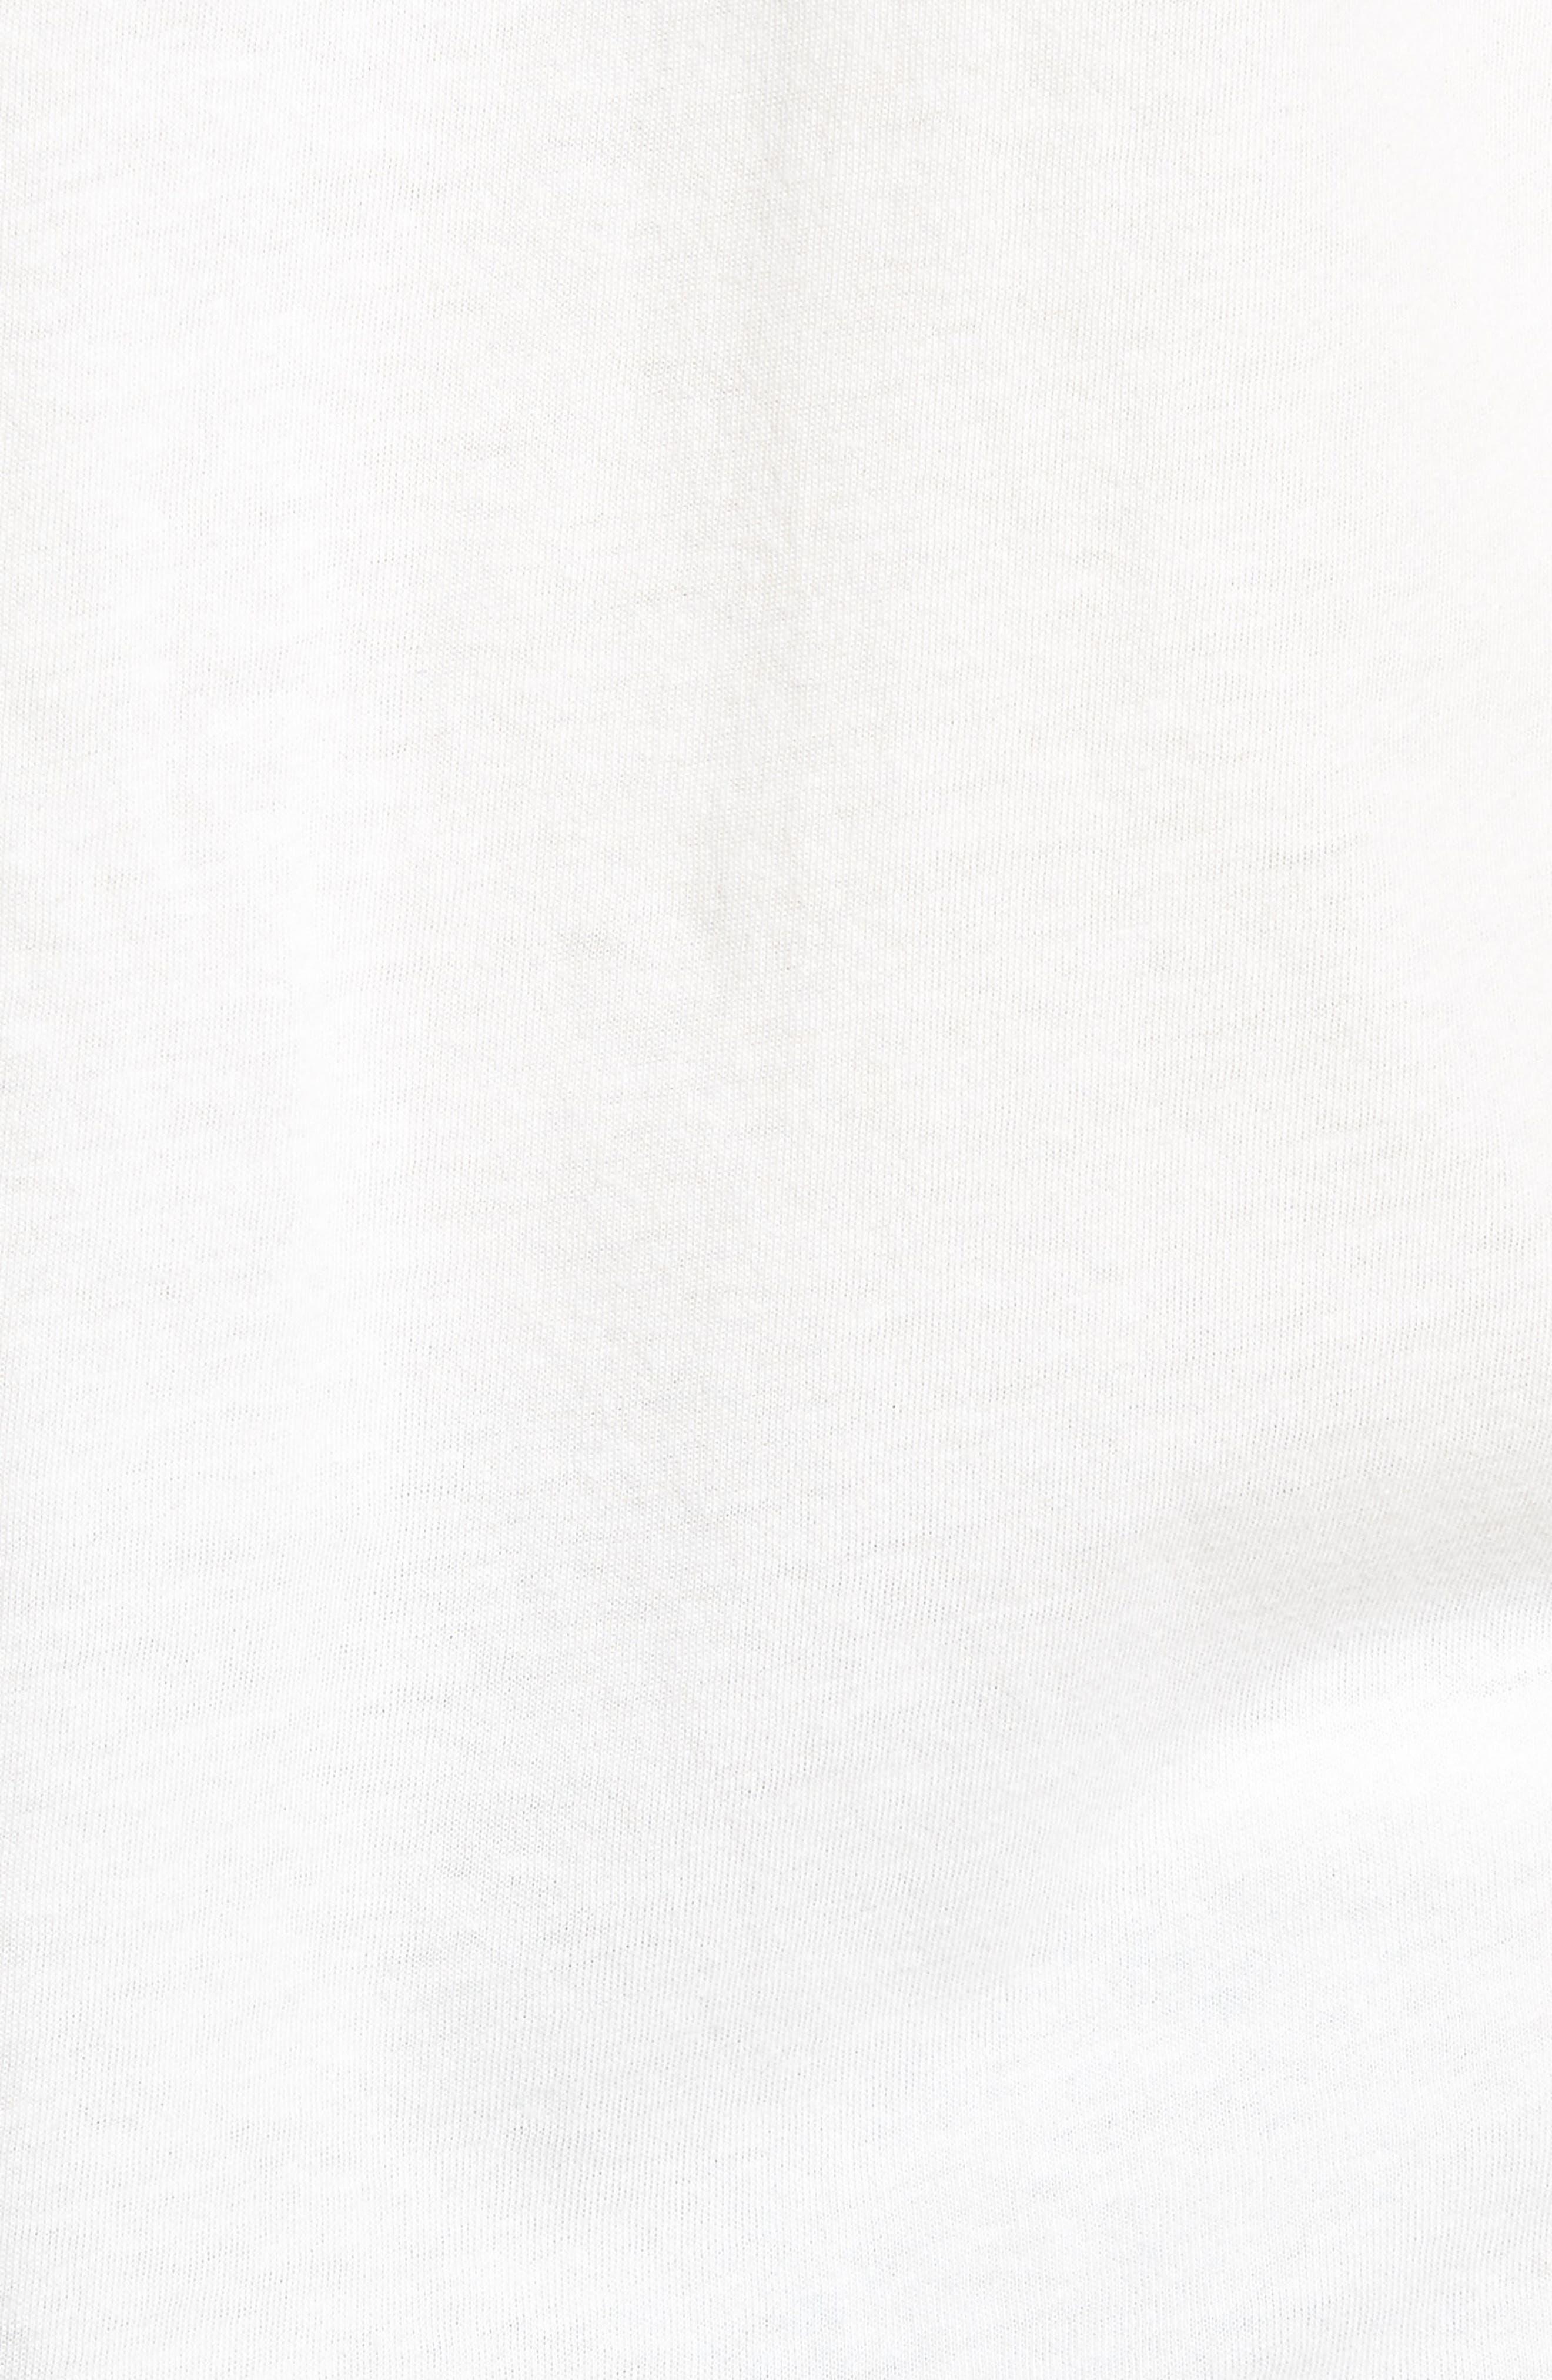 Kelsey ANP Motors T-Shirt,                             Alternate thumbnail 5, color,                             Ivory